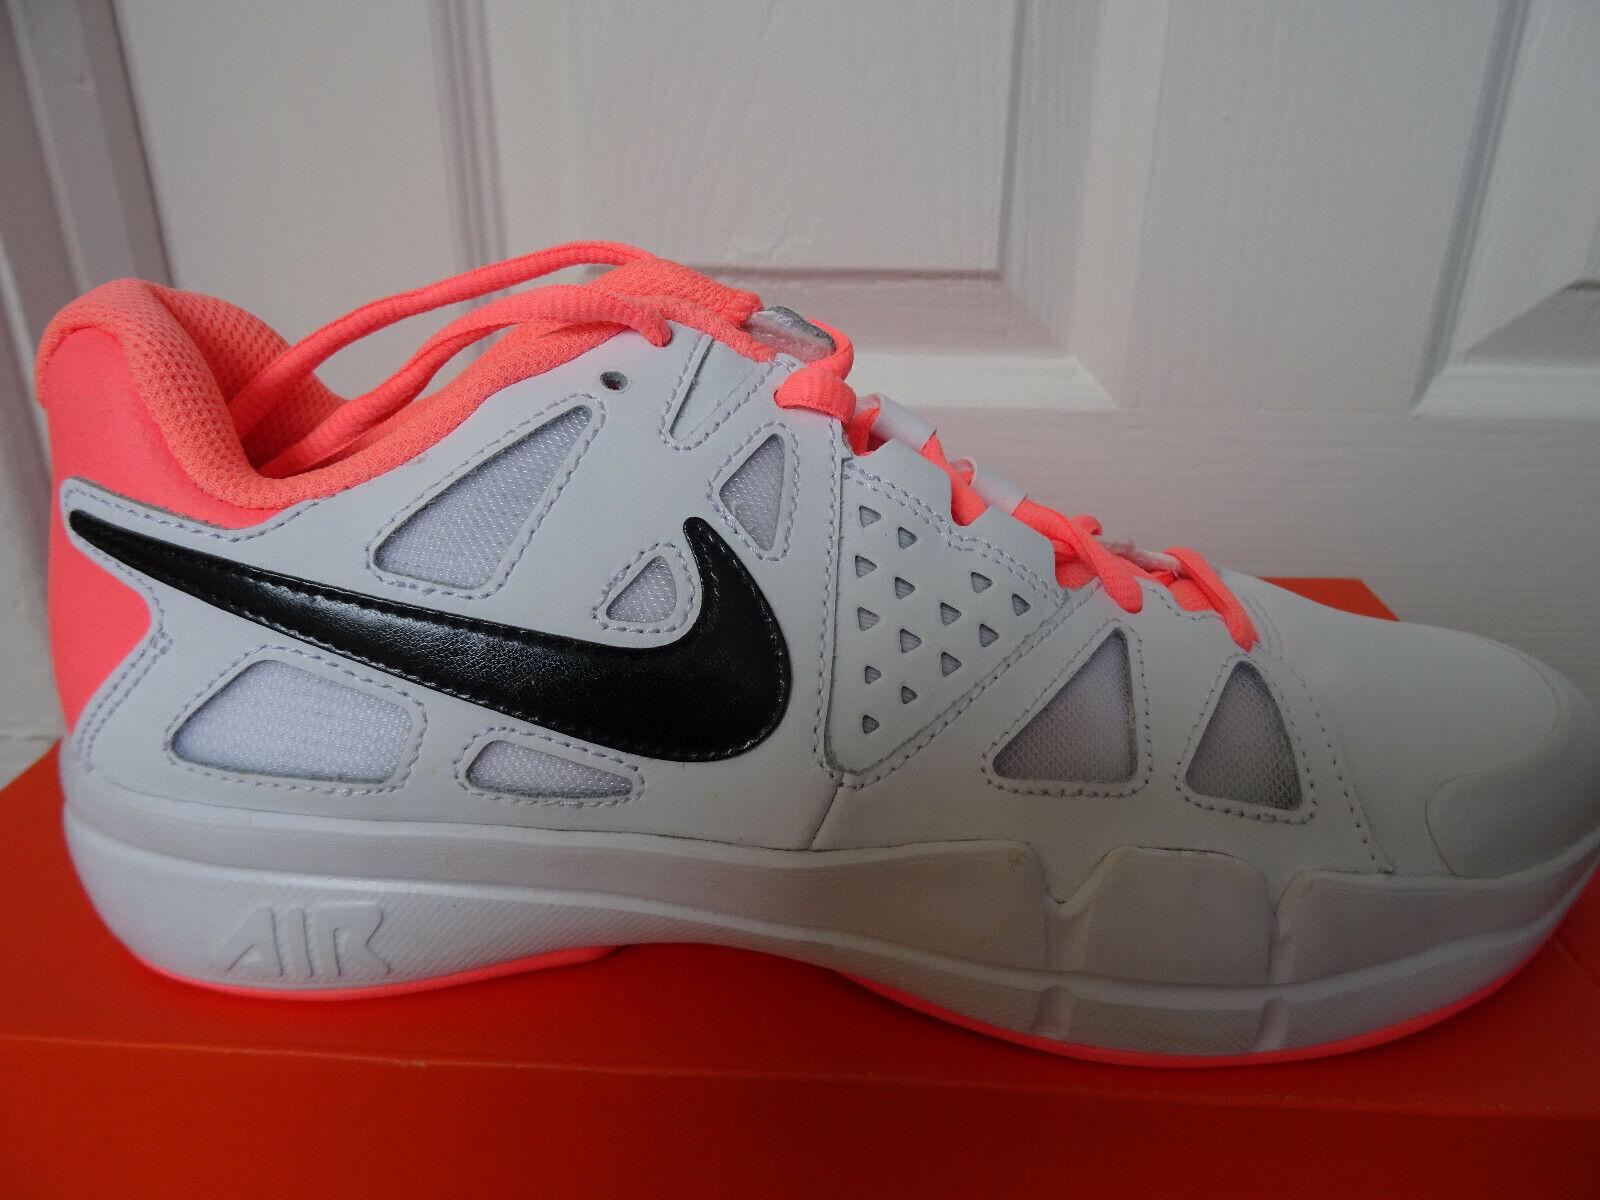 Nike Air Vapor Advantage CLY schuhe 101 uk 7 eu 41 us 9.5